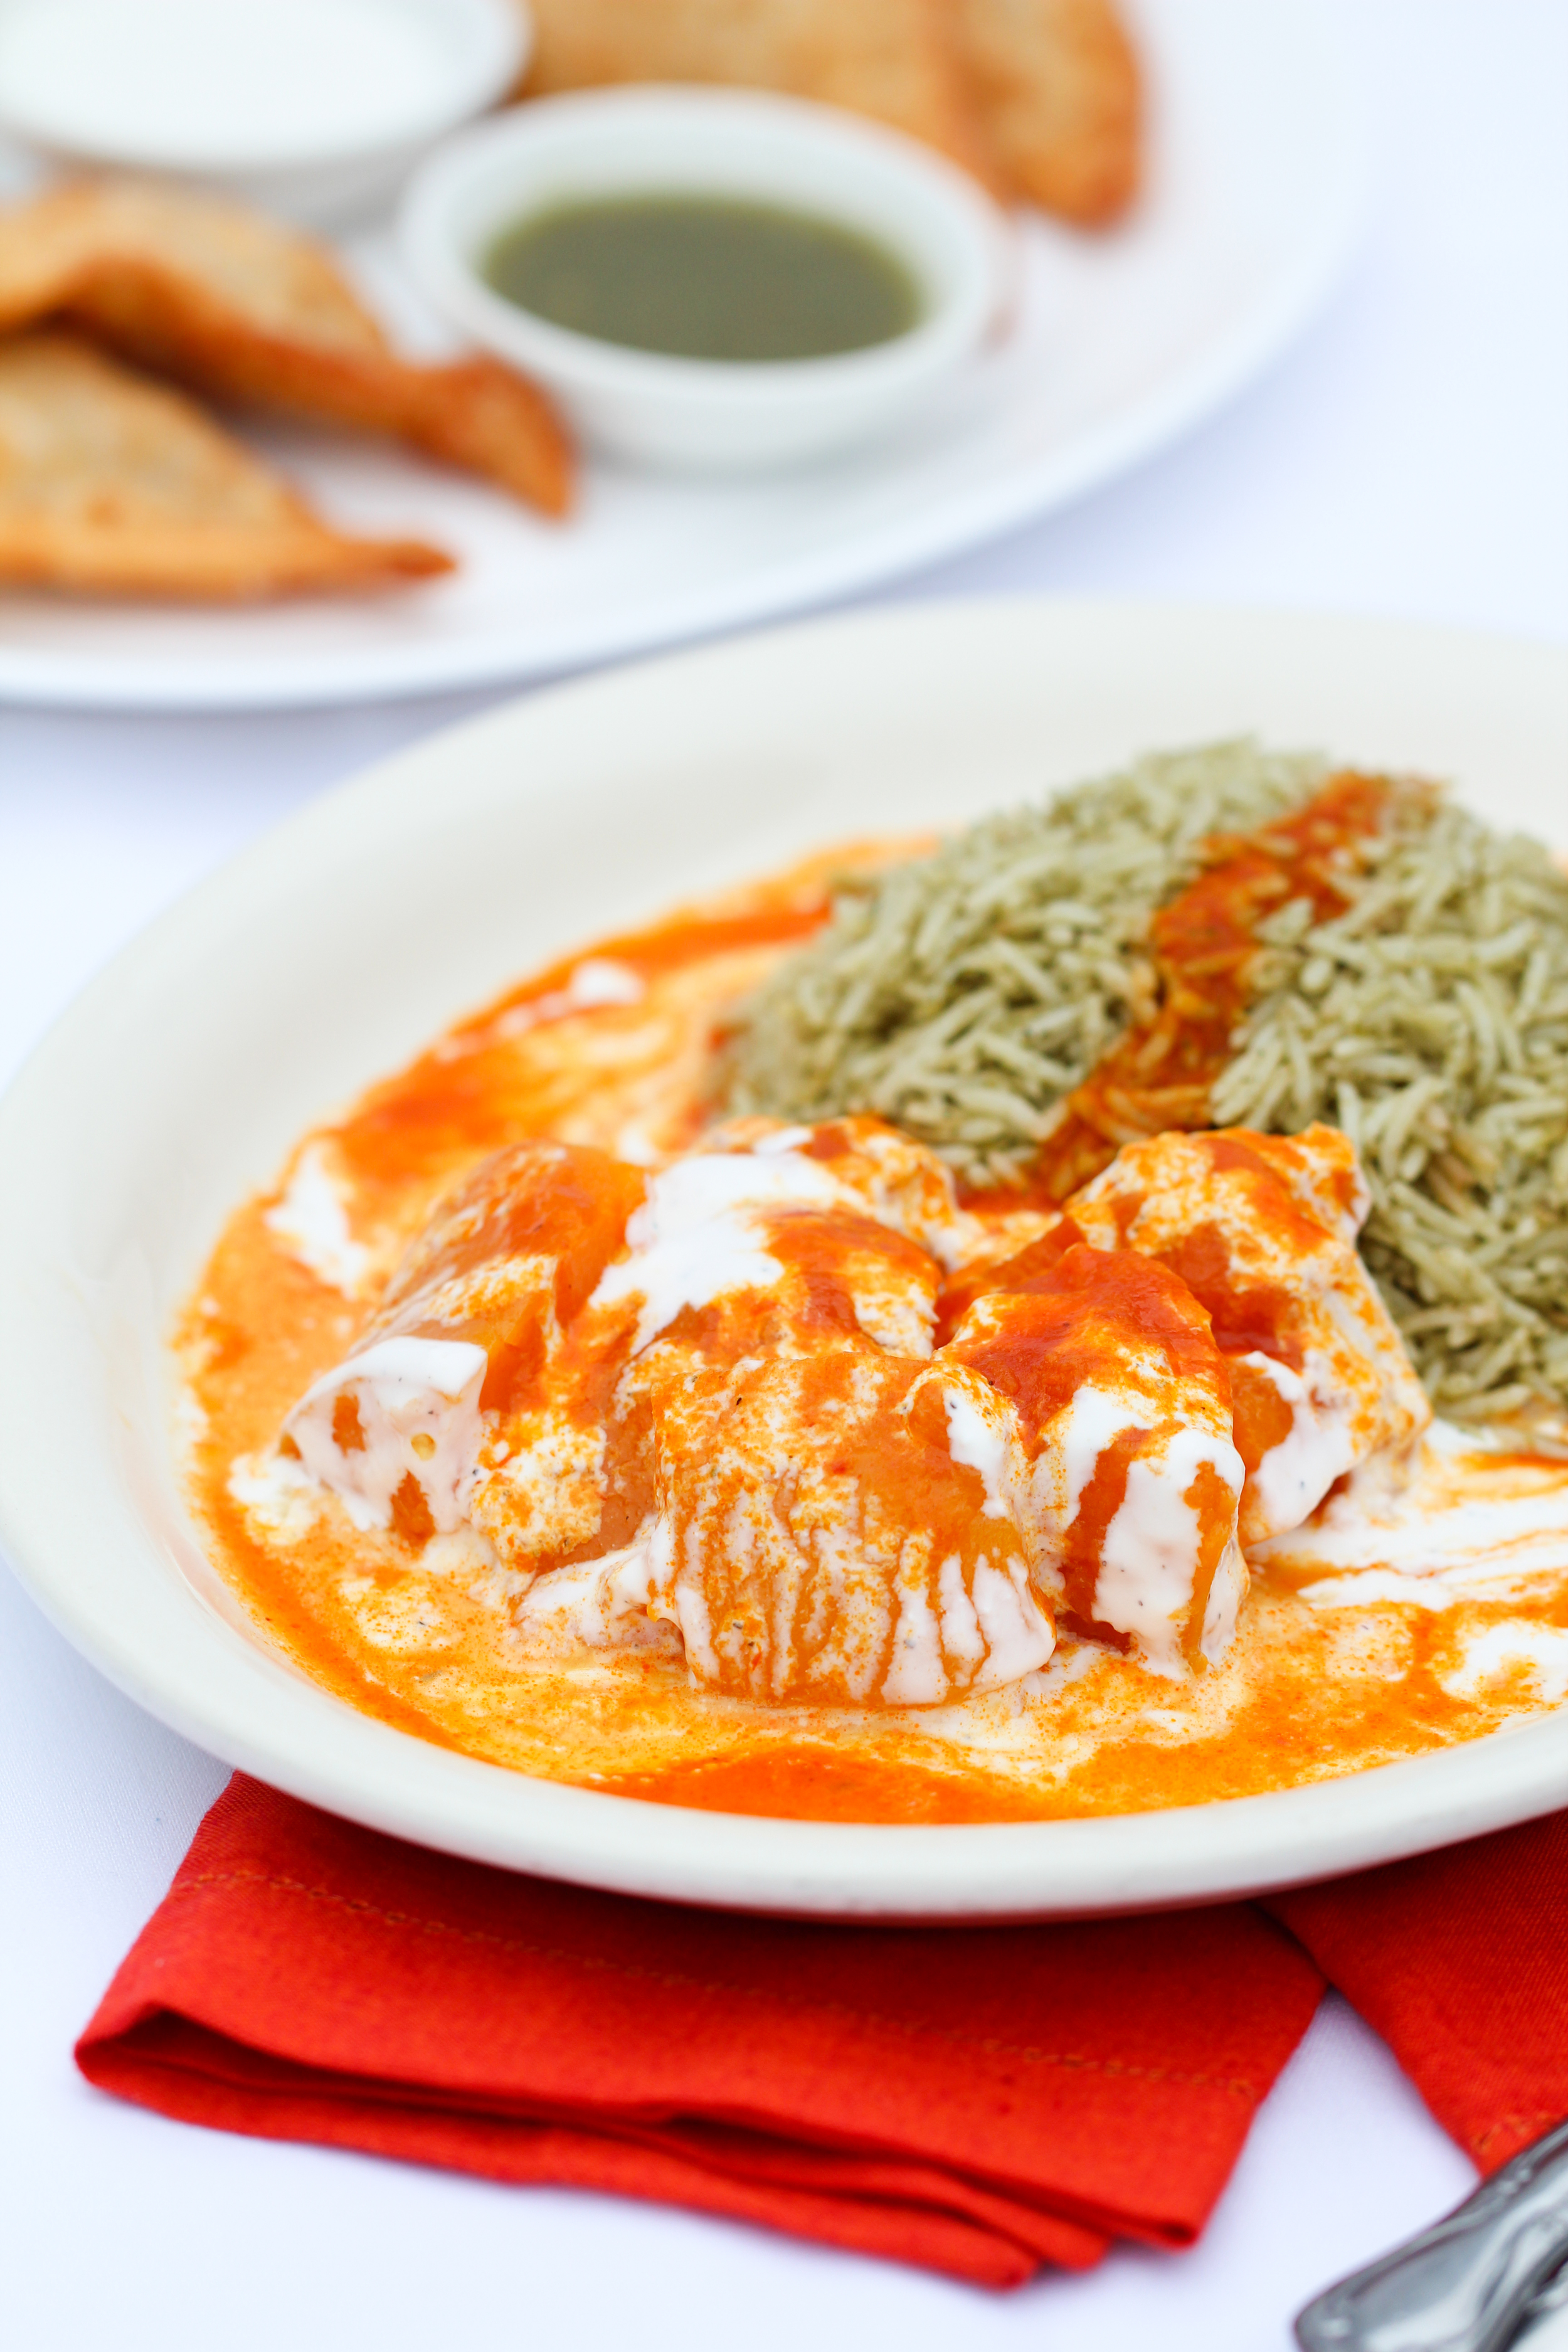 Panjshir Cam 1-1-nabu-food-photography.jpg